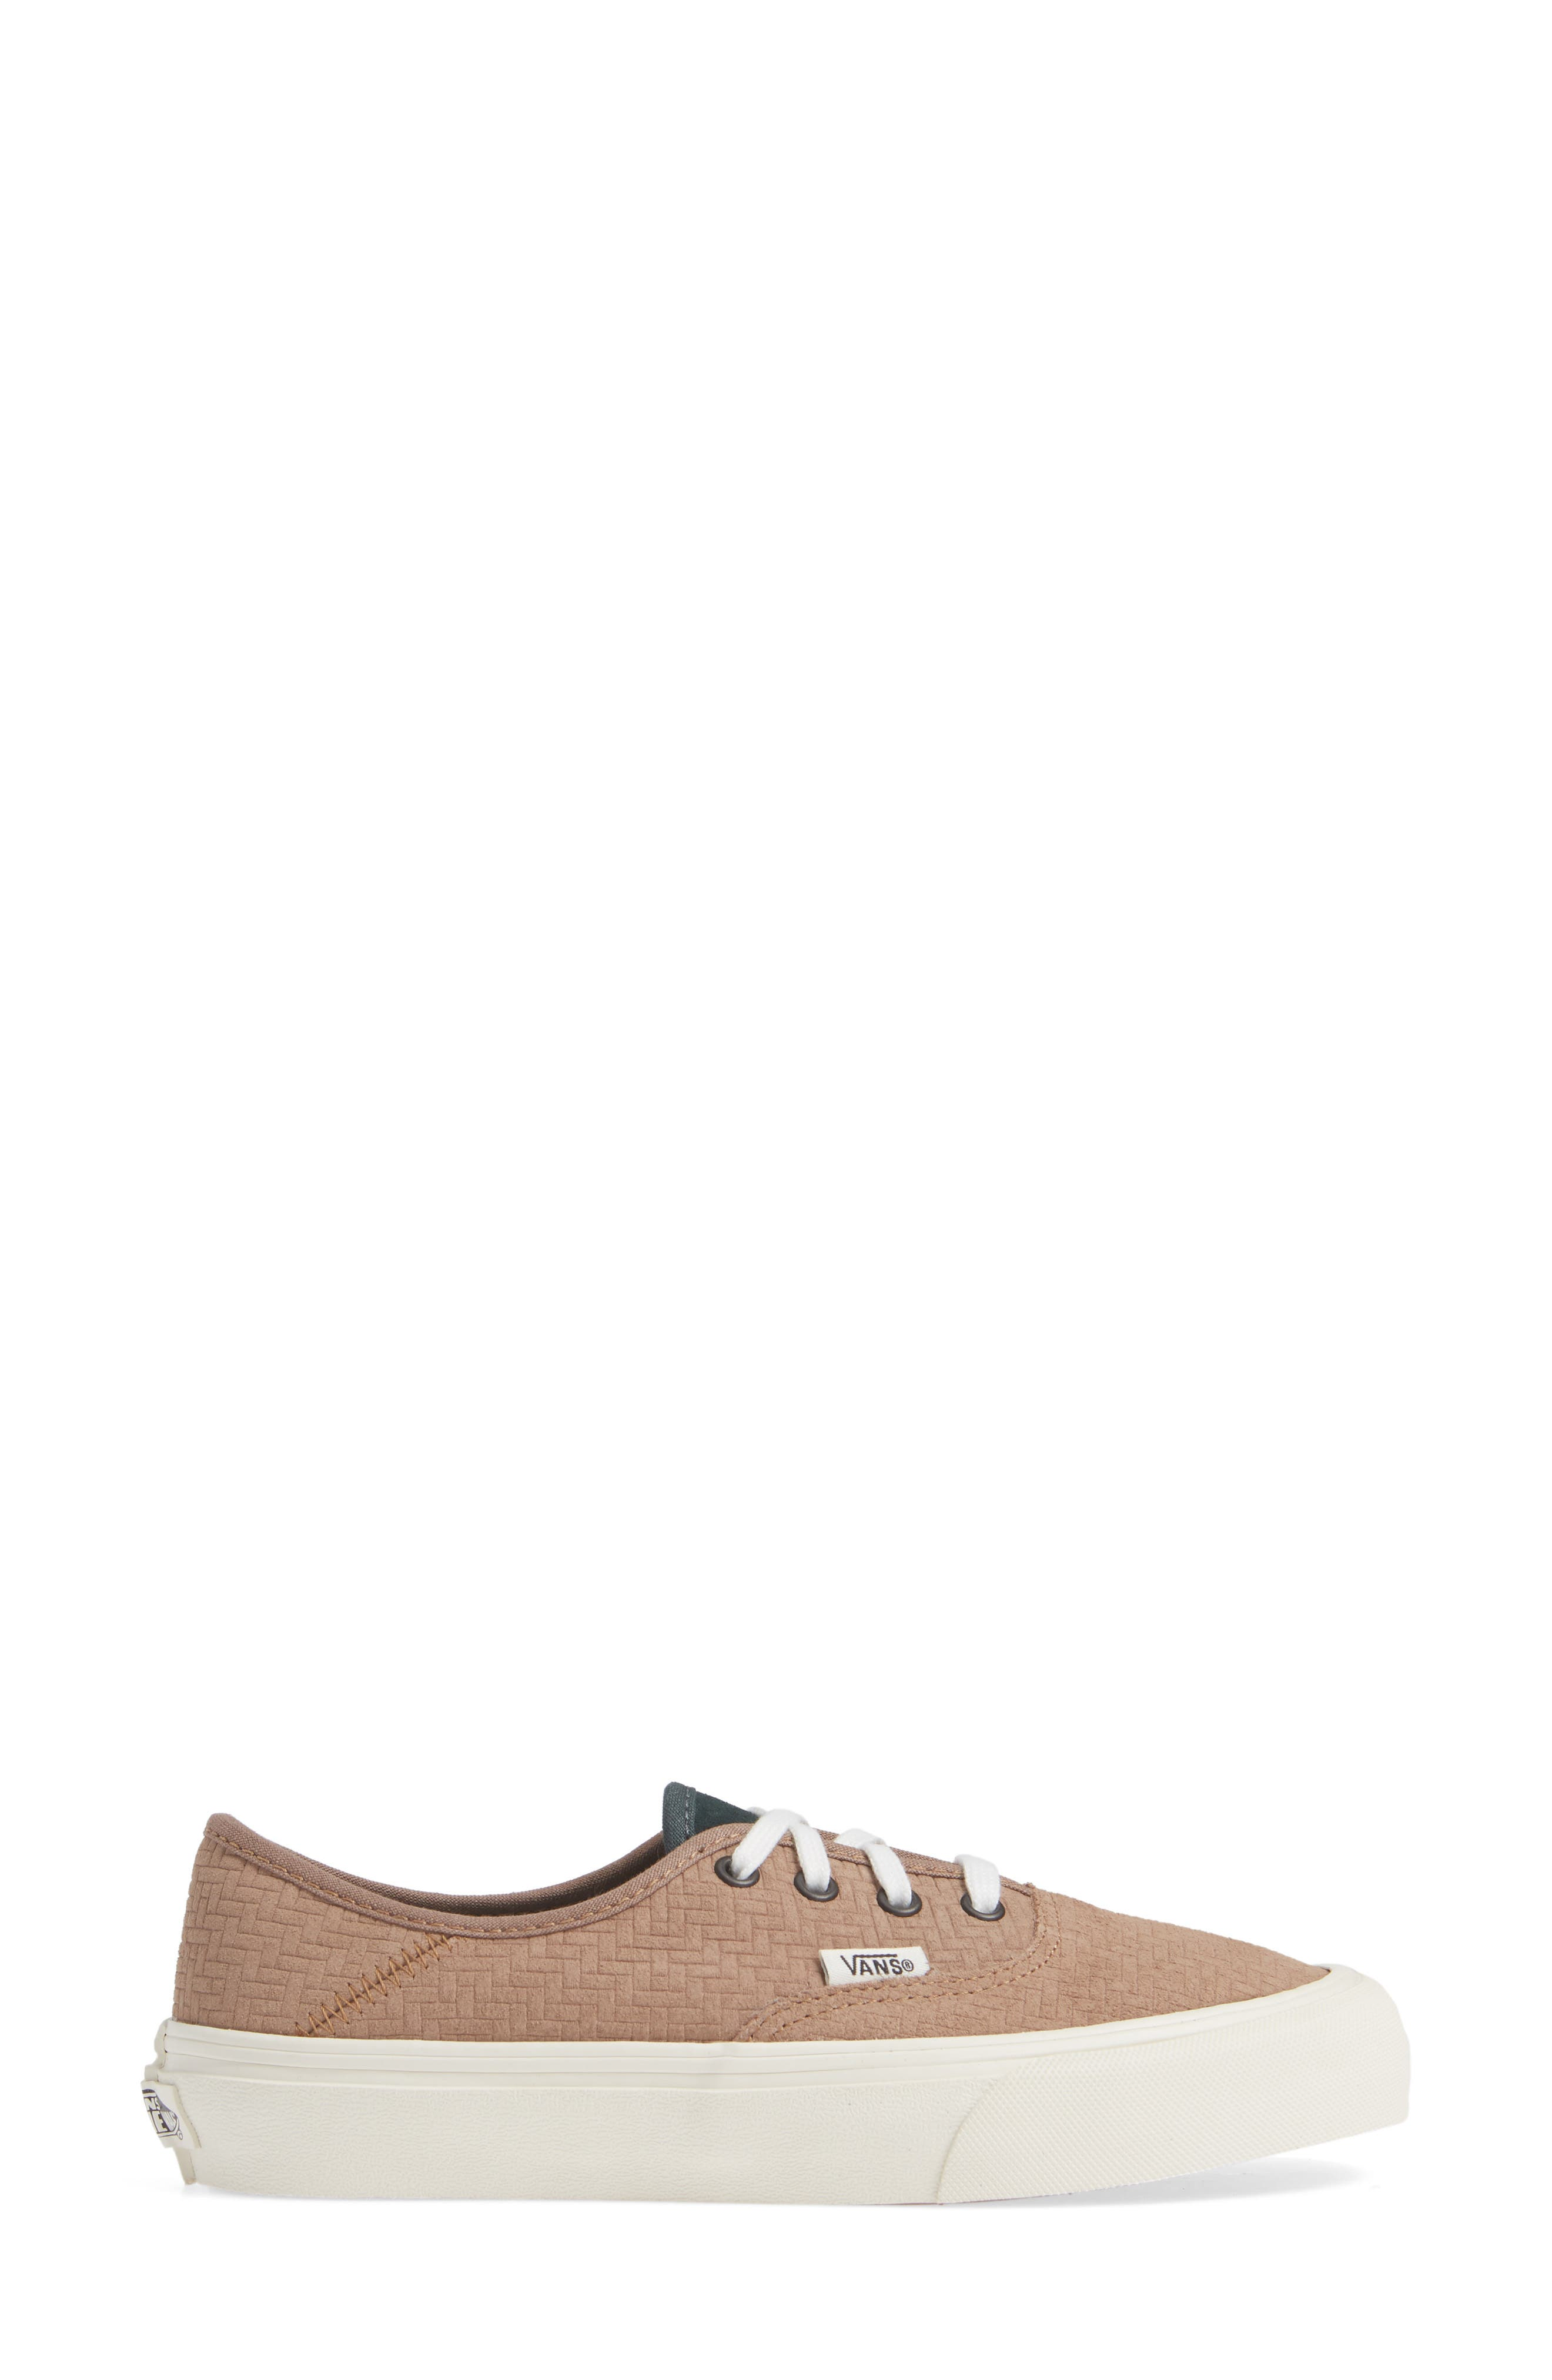 UA Authentic SF Collapsible Heel Sneaker,                             Alternate thumbnail 3, color,                             WOODSMOKE/ DARKEST SPRUCE